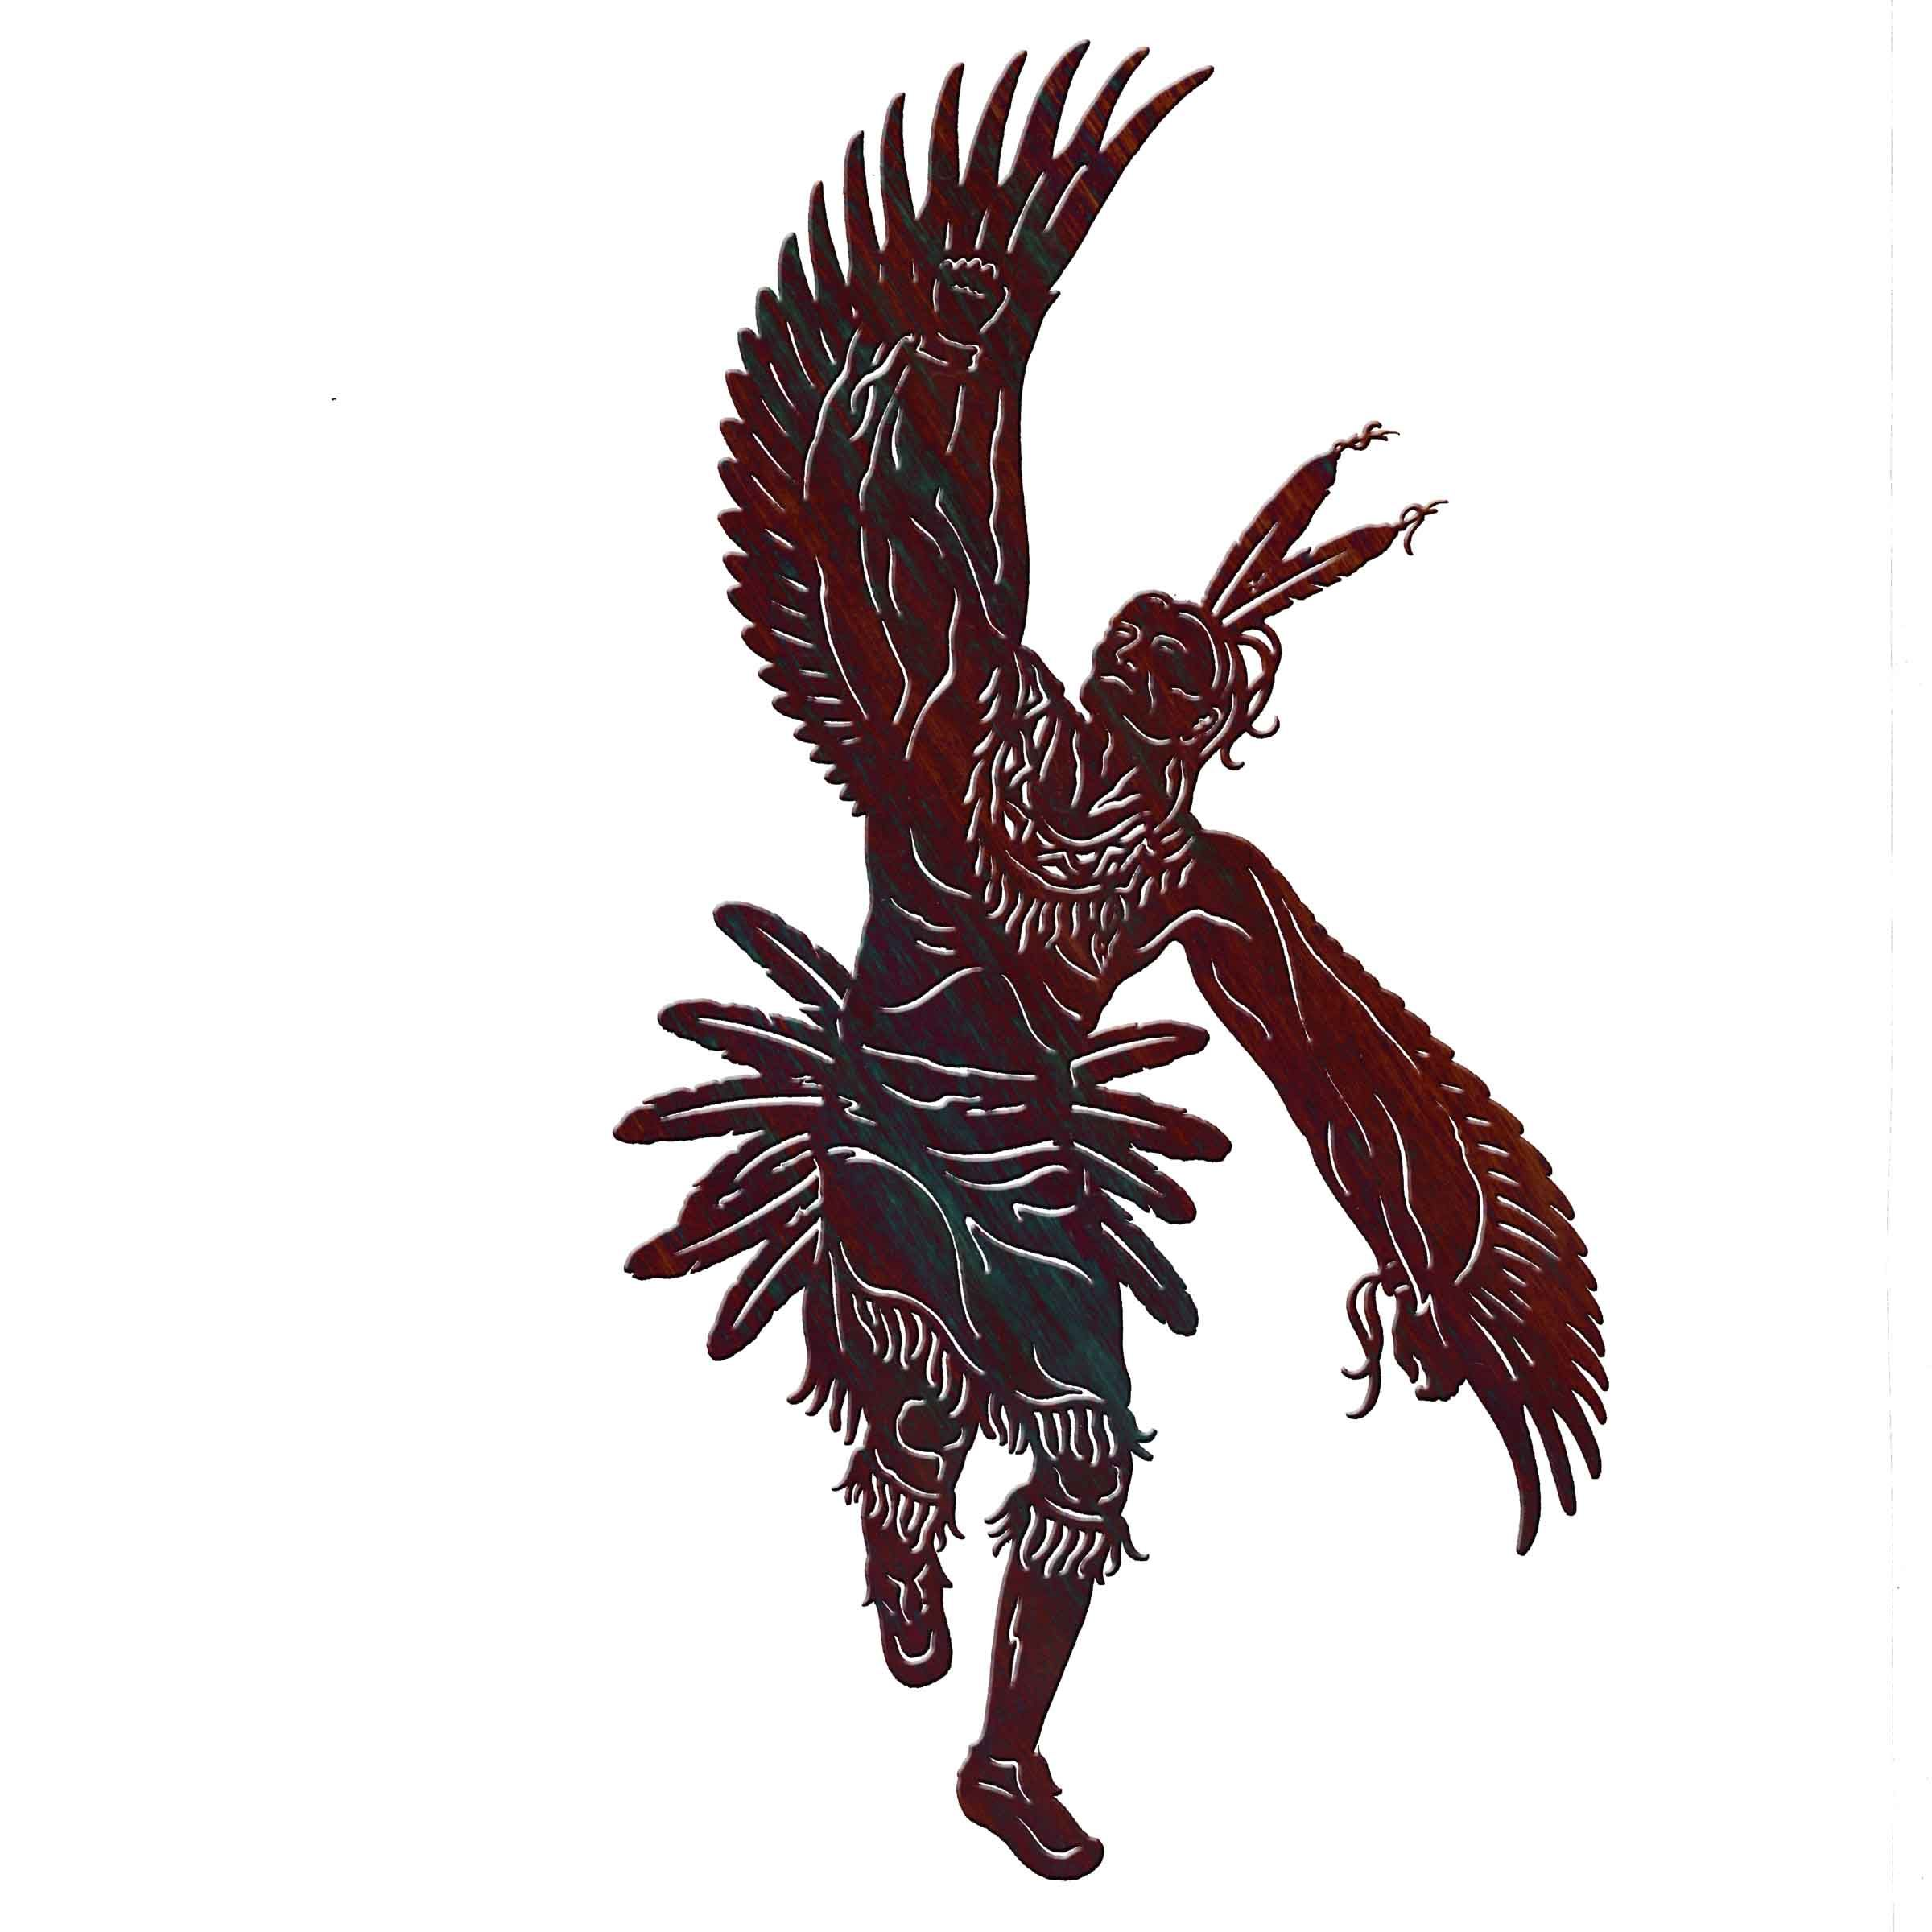 dfc93daf2a996 Eagle Artwork, Eagle Drawing, Native American Tribes, American Indians,  Native Americans